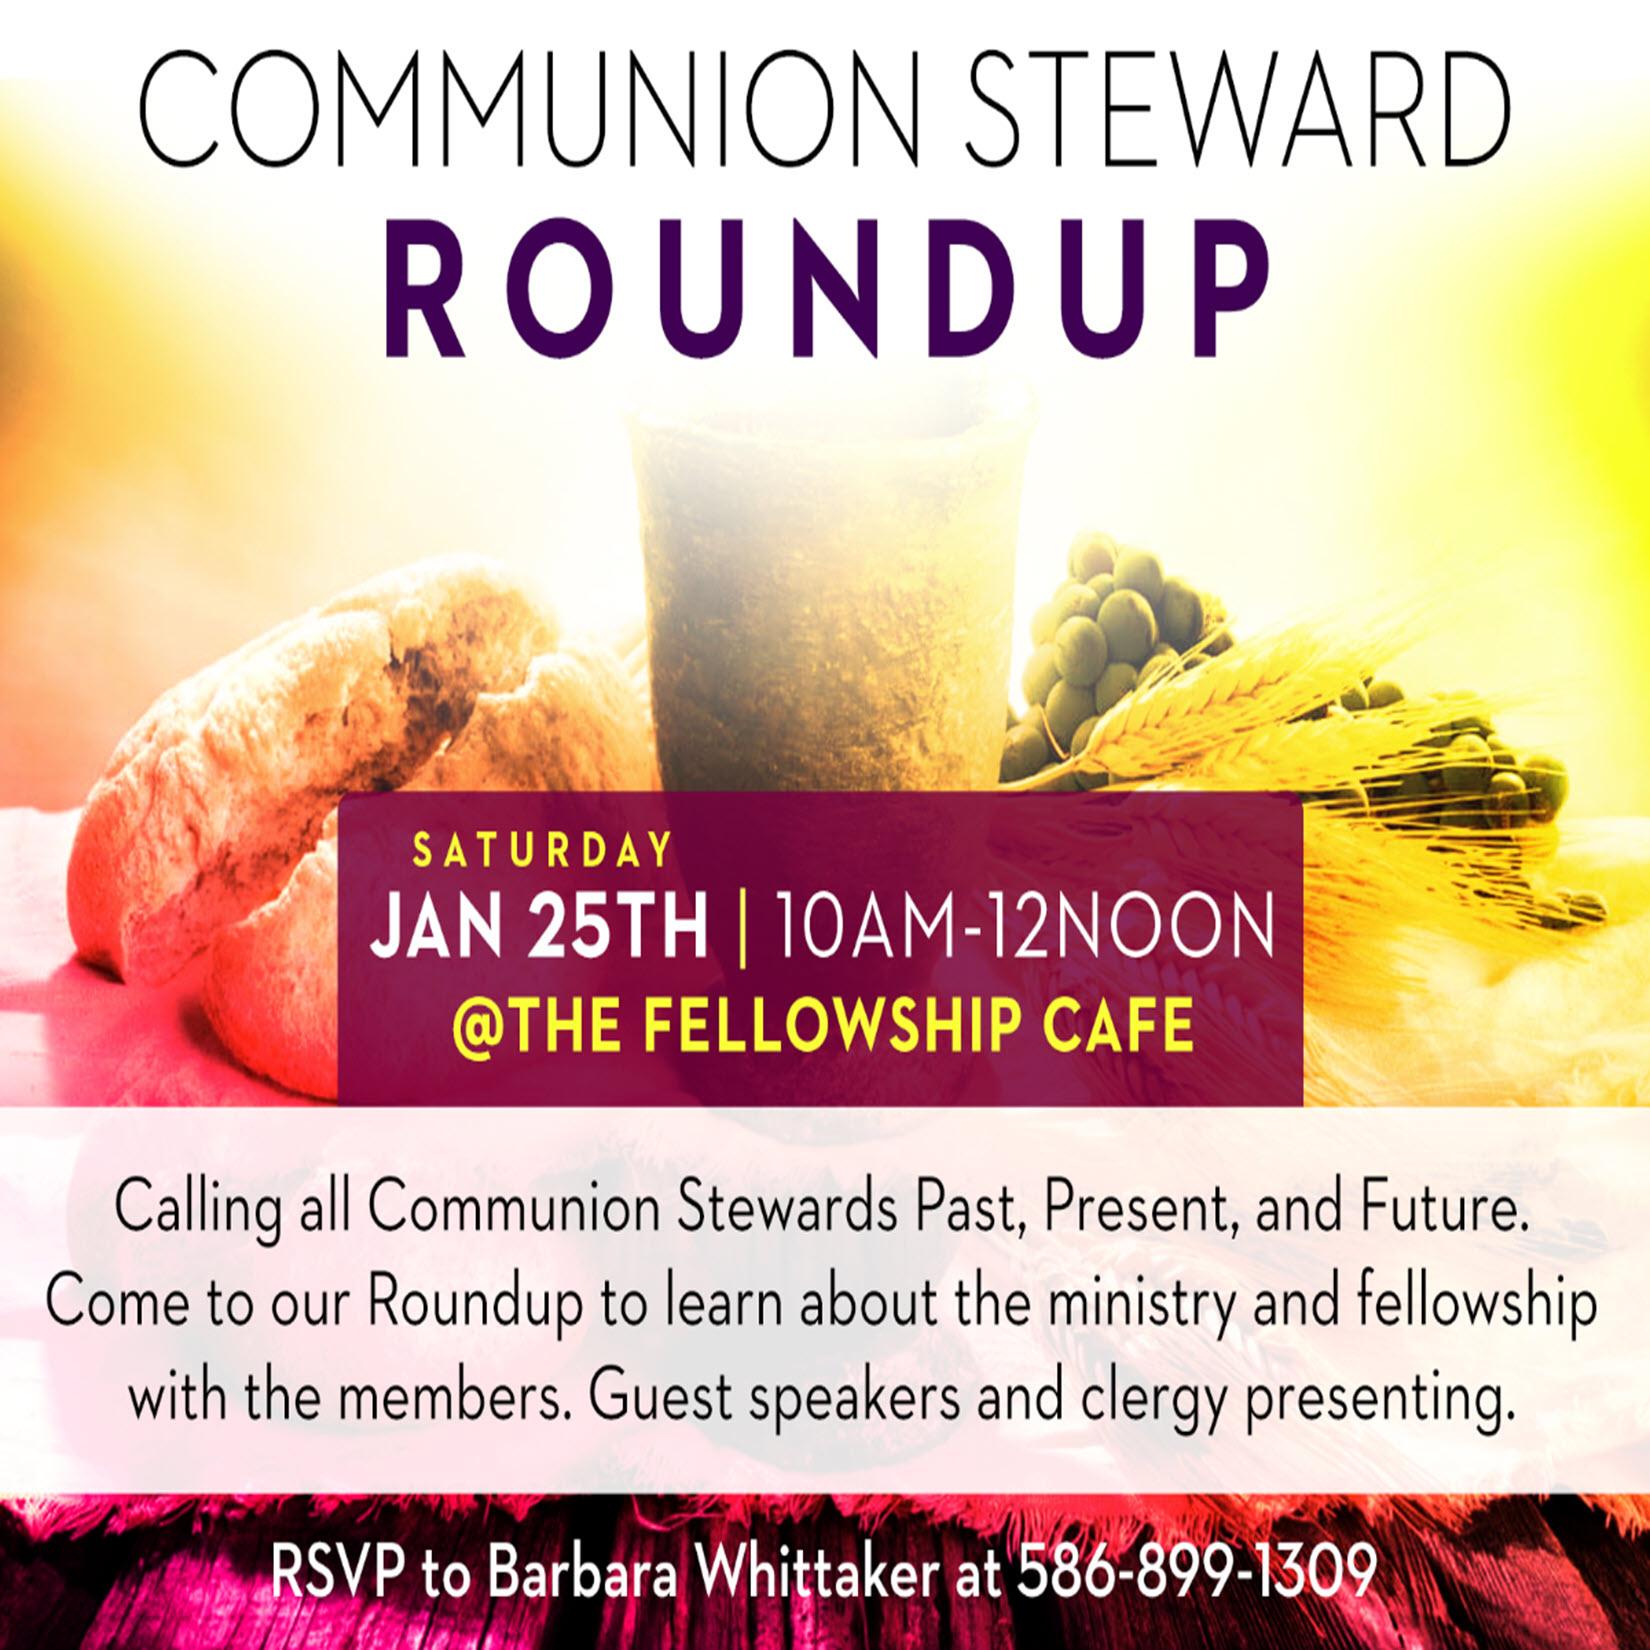 Communion Steward Roundup